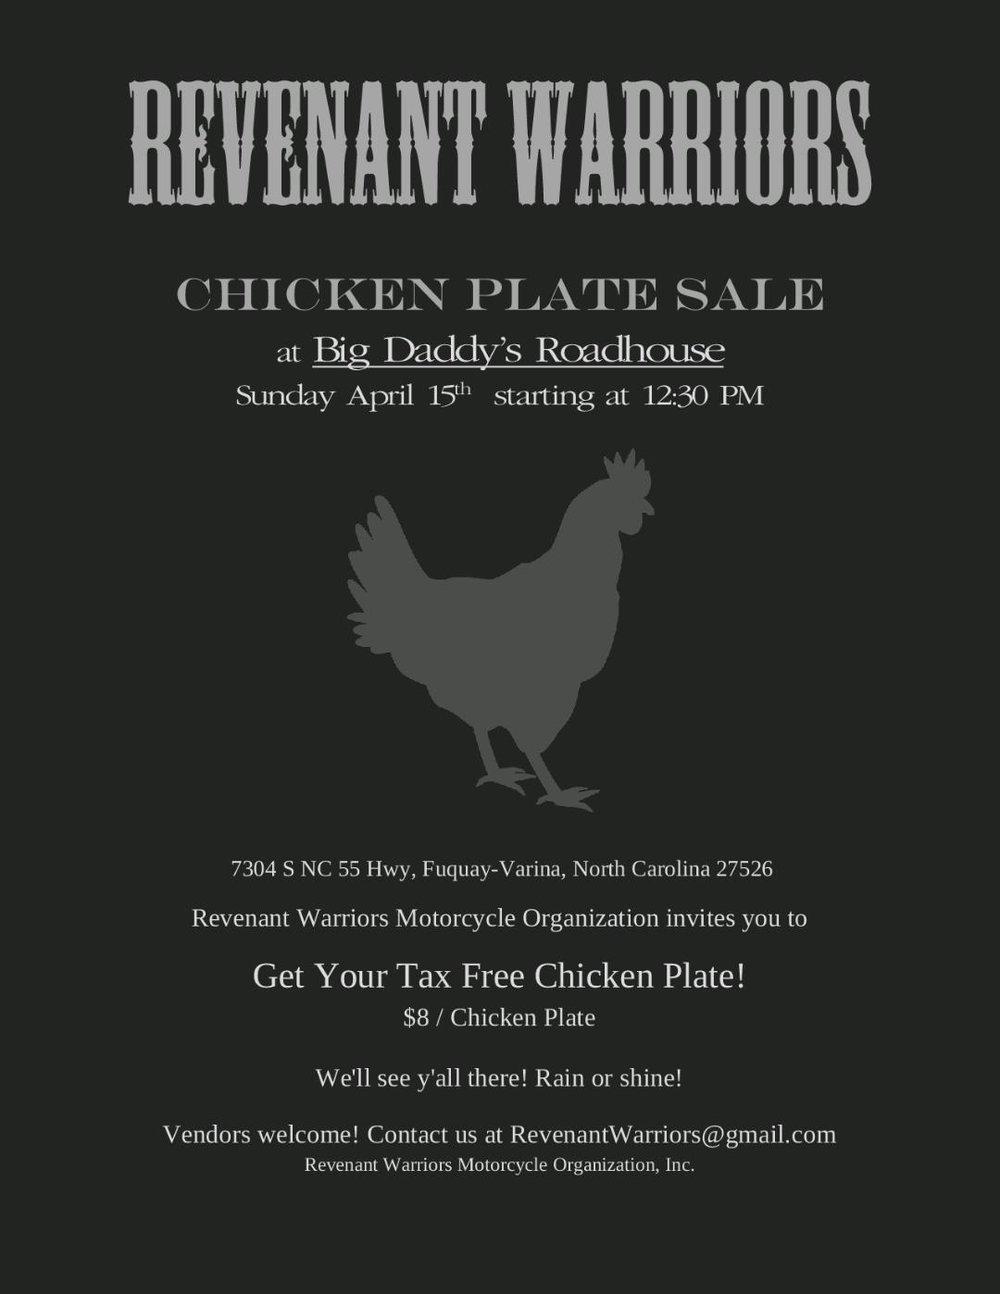 RWMO.Chicken.Plate.2018.04.jpg